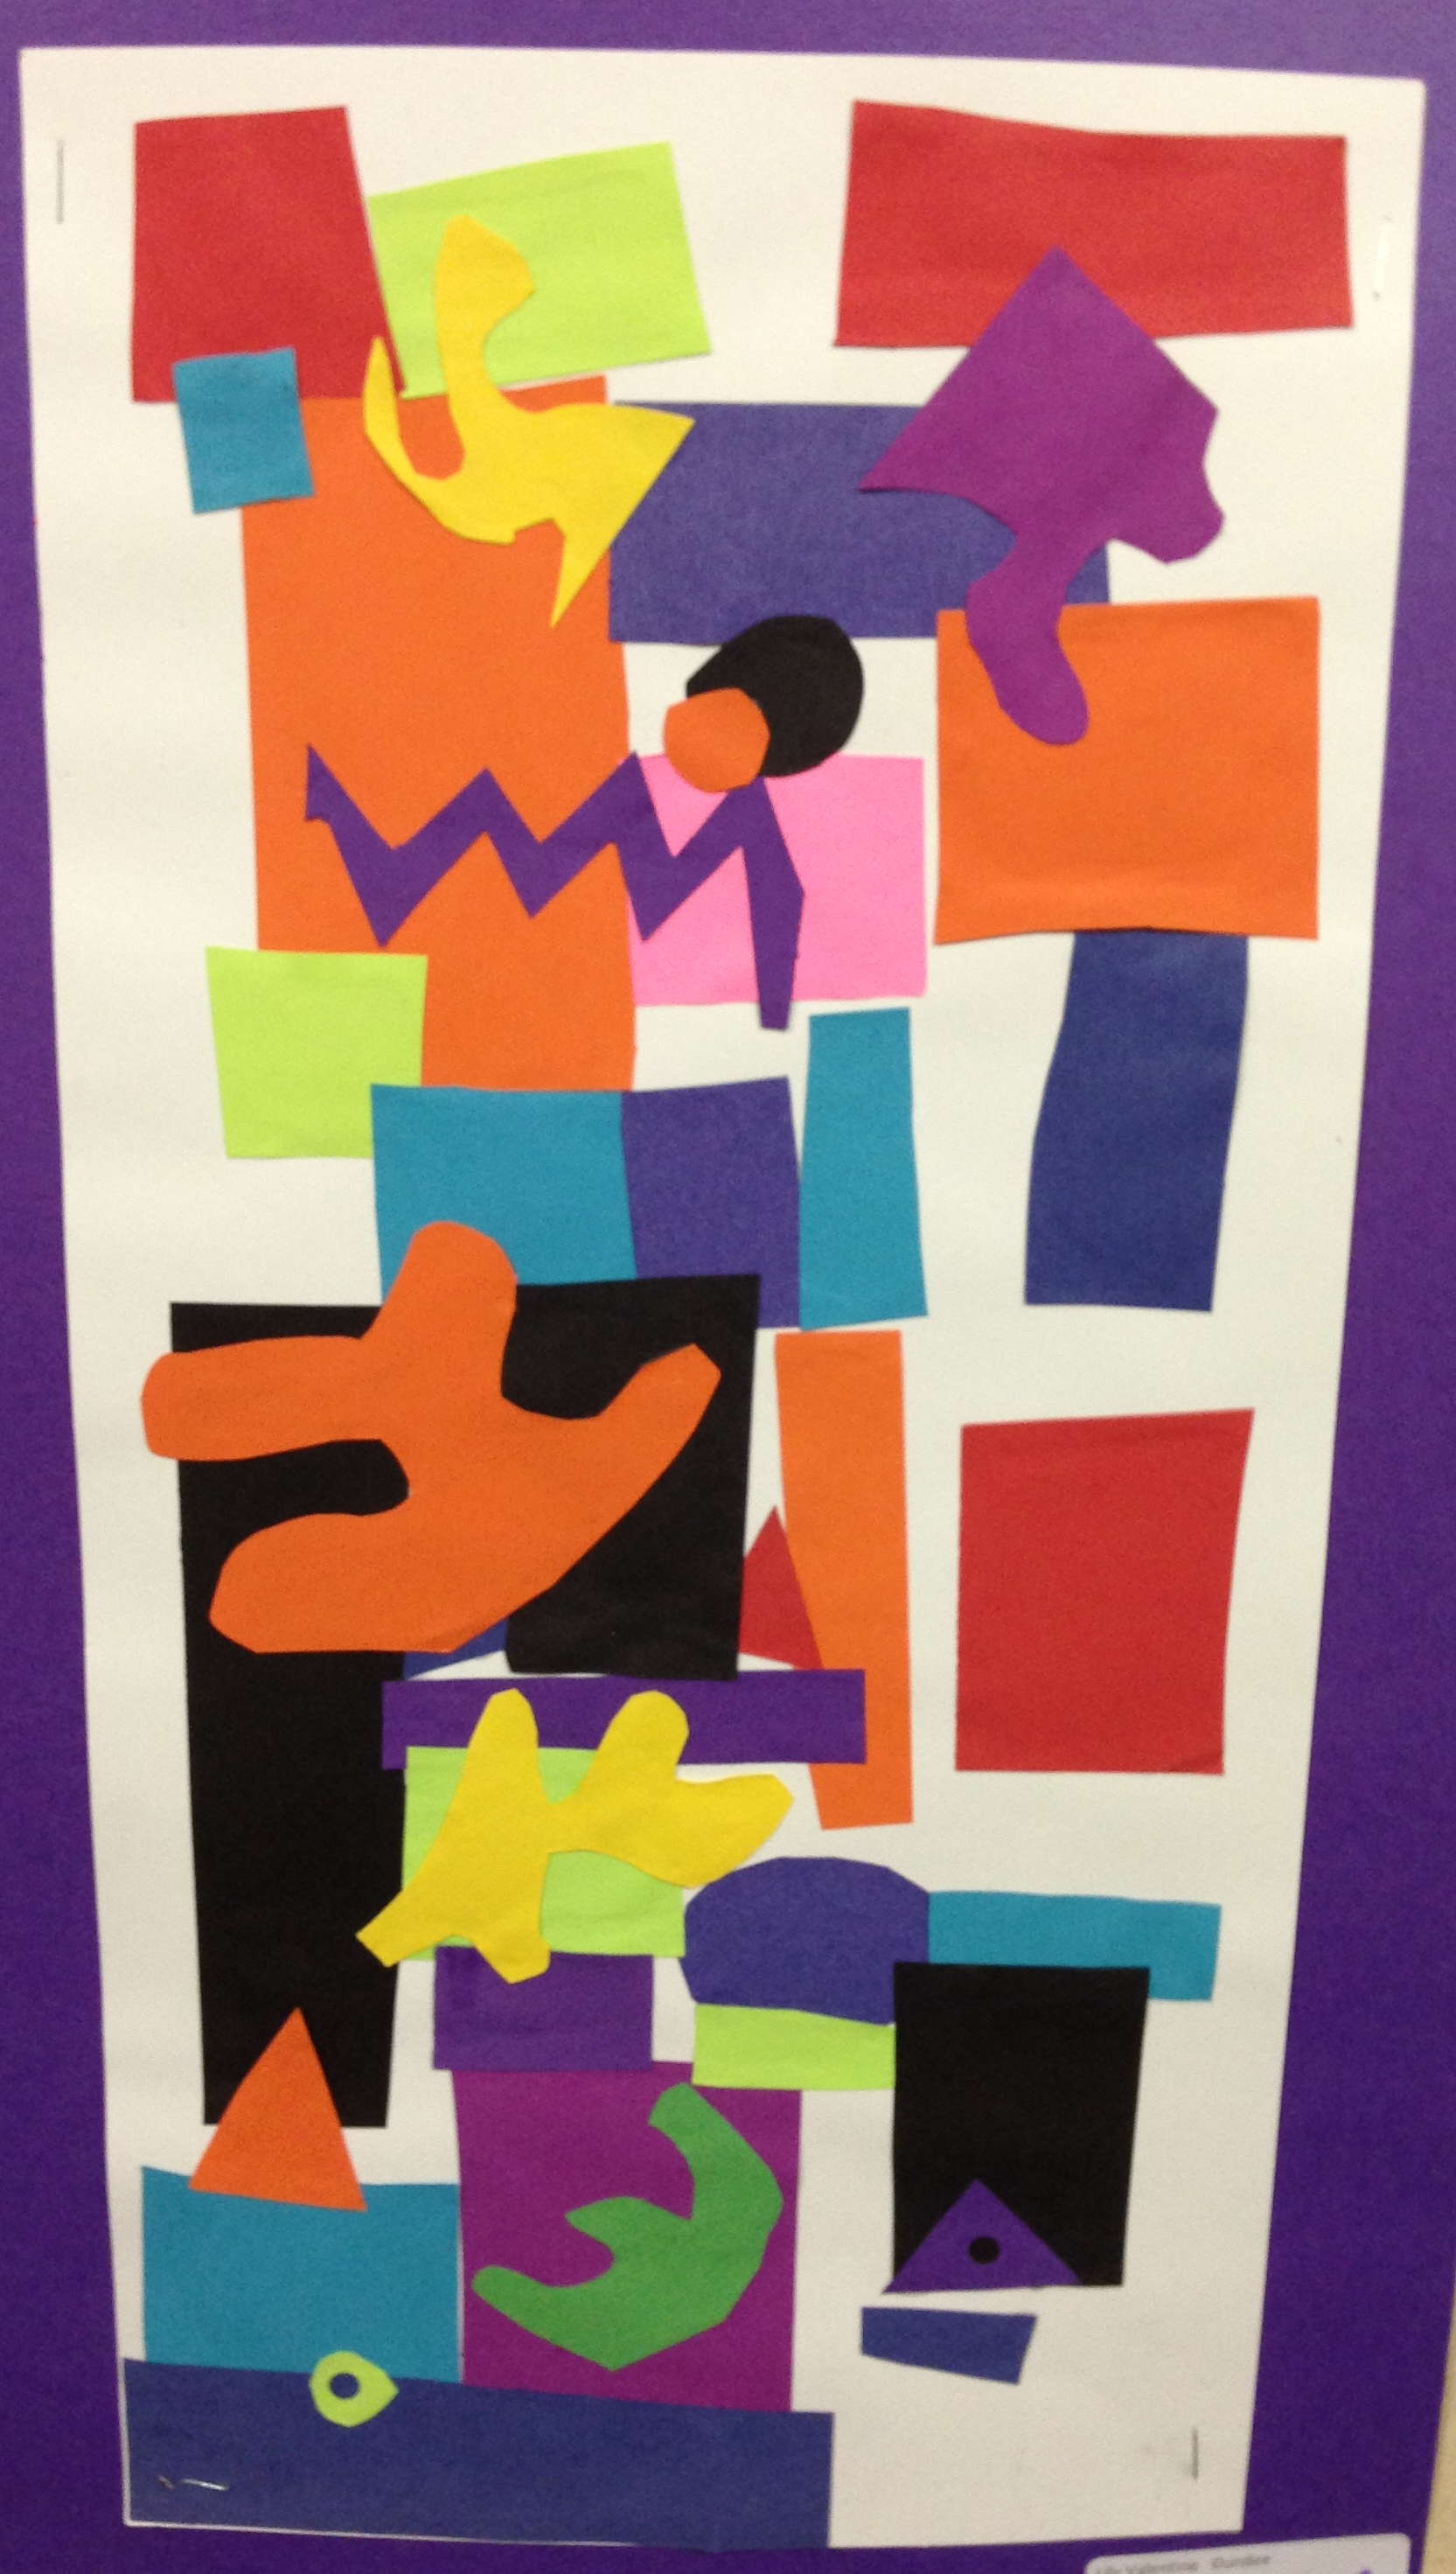 The Smartteacher Resource Matisse Inspired Collage